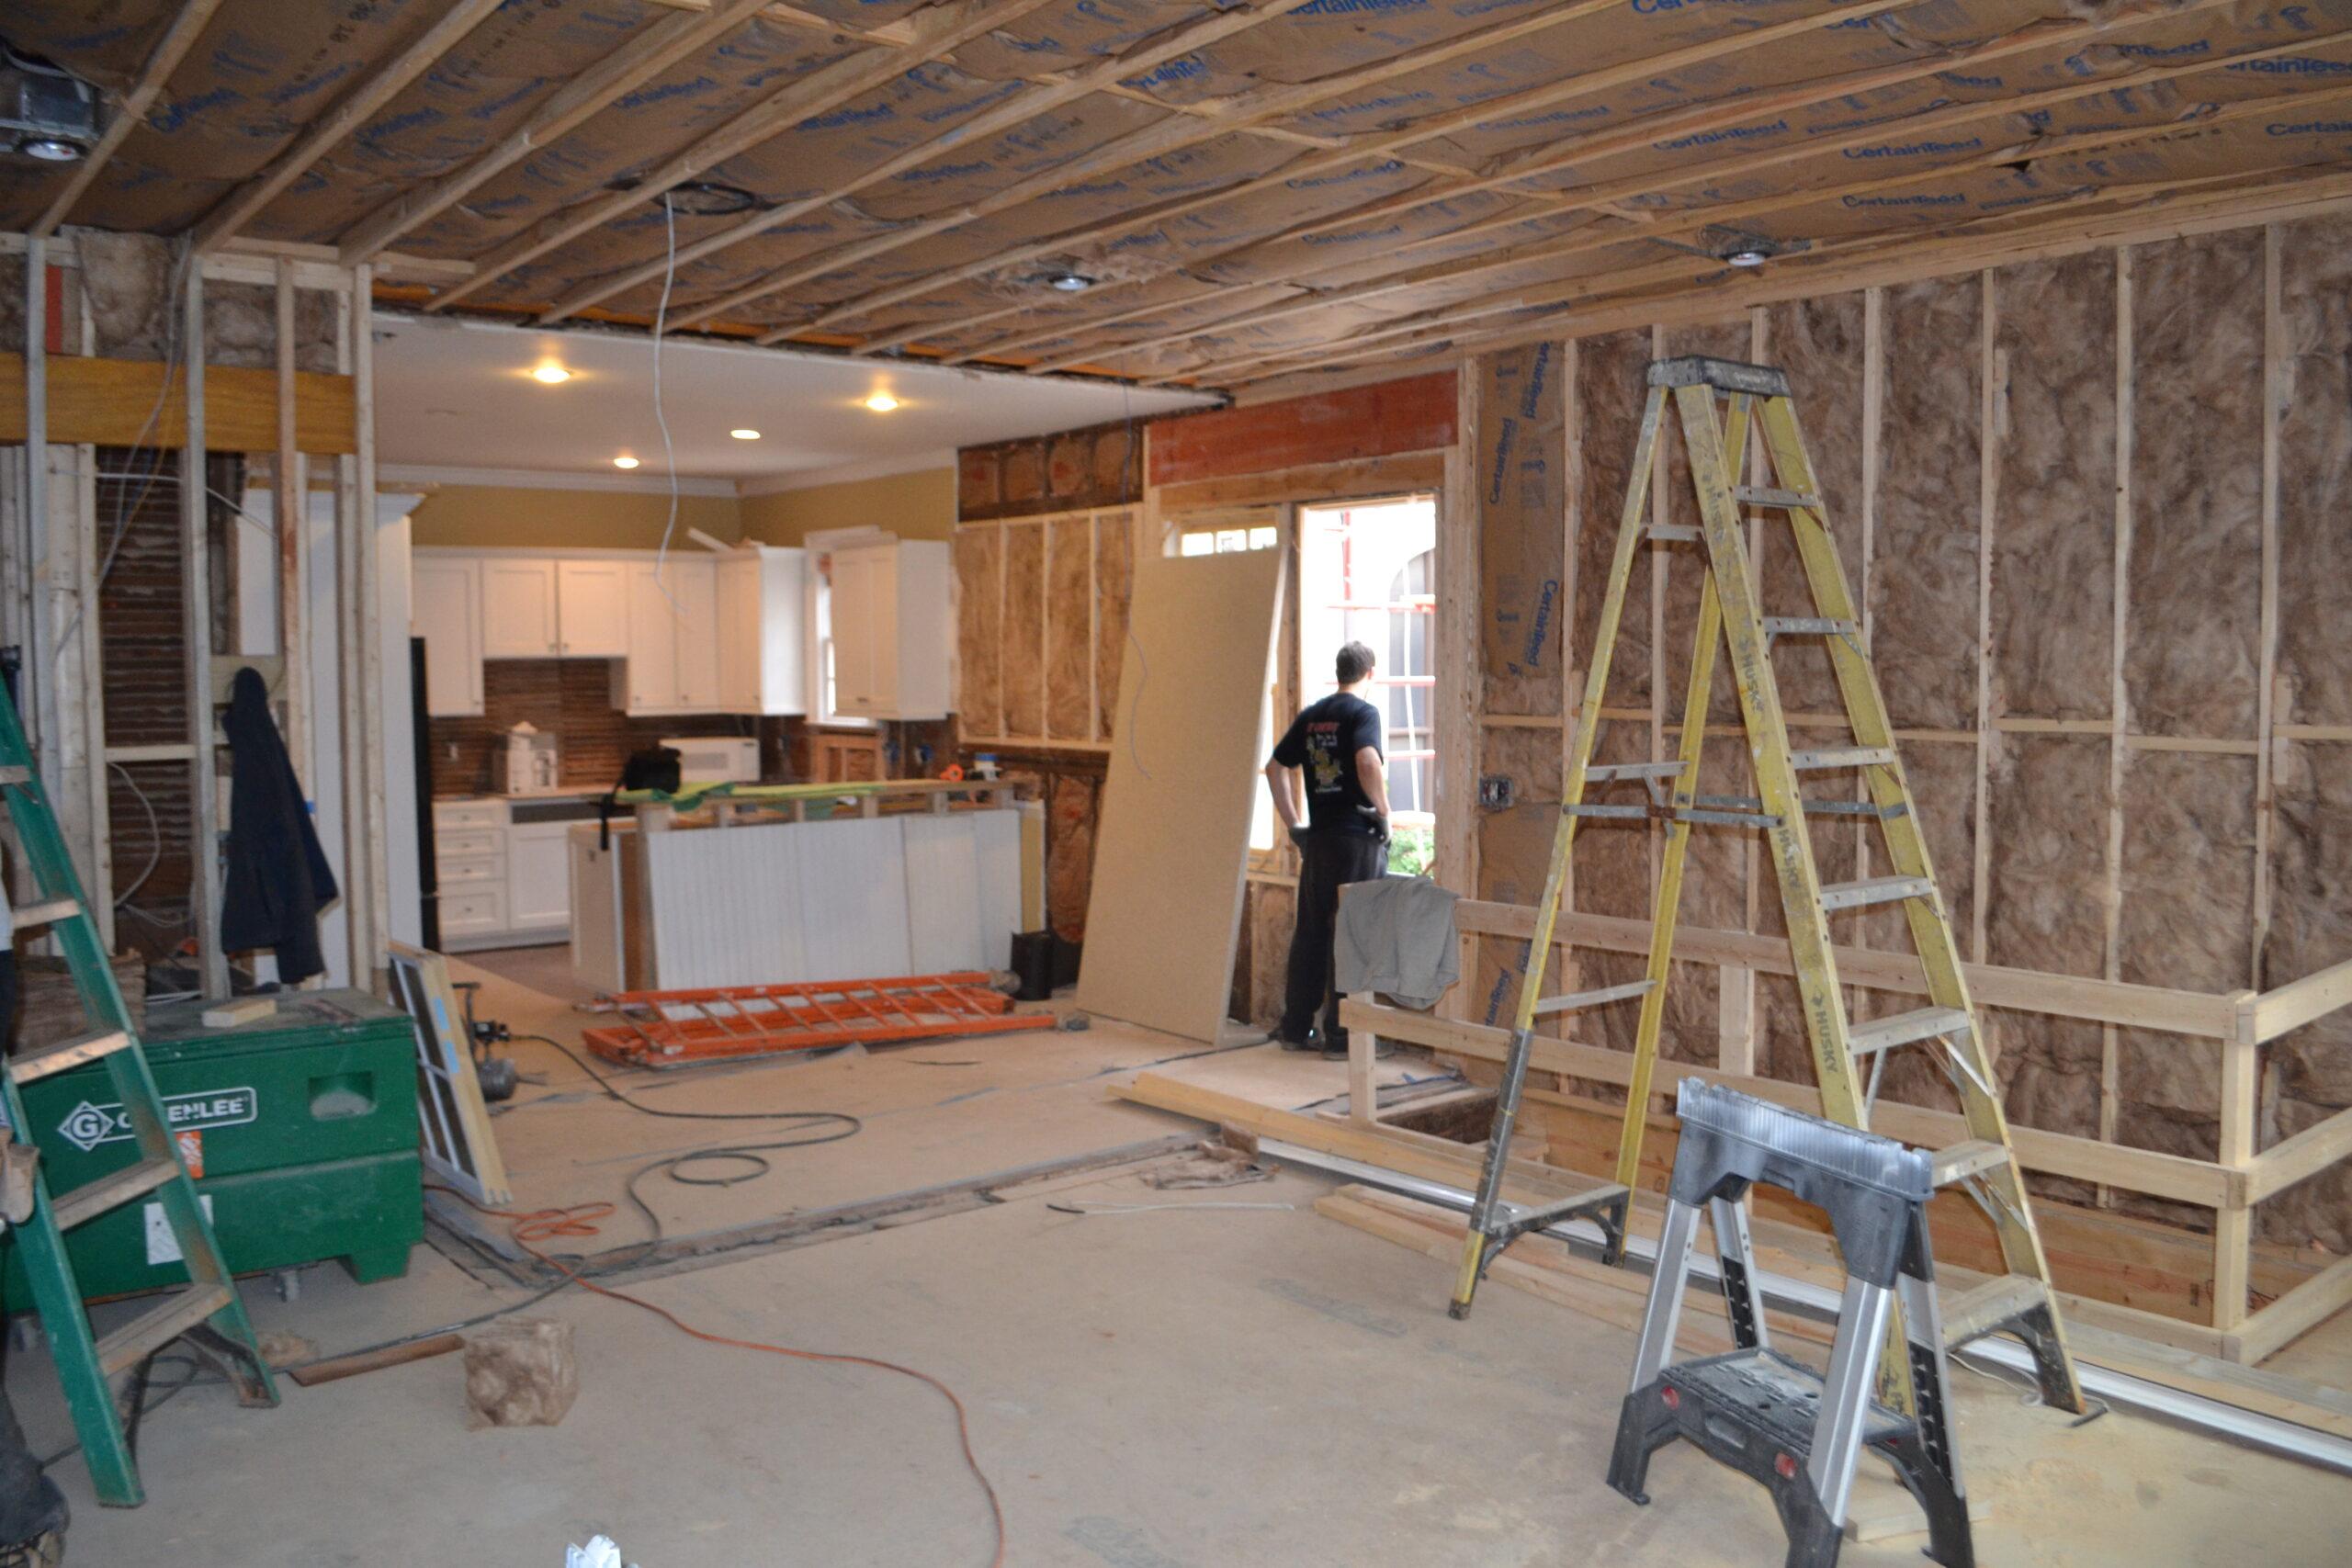 TAU BUILDERS: Contractor for Renovations Orlando Fl